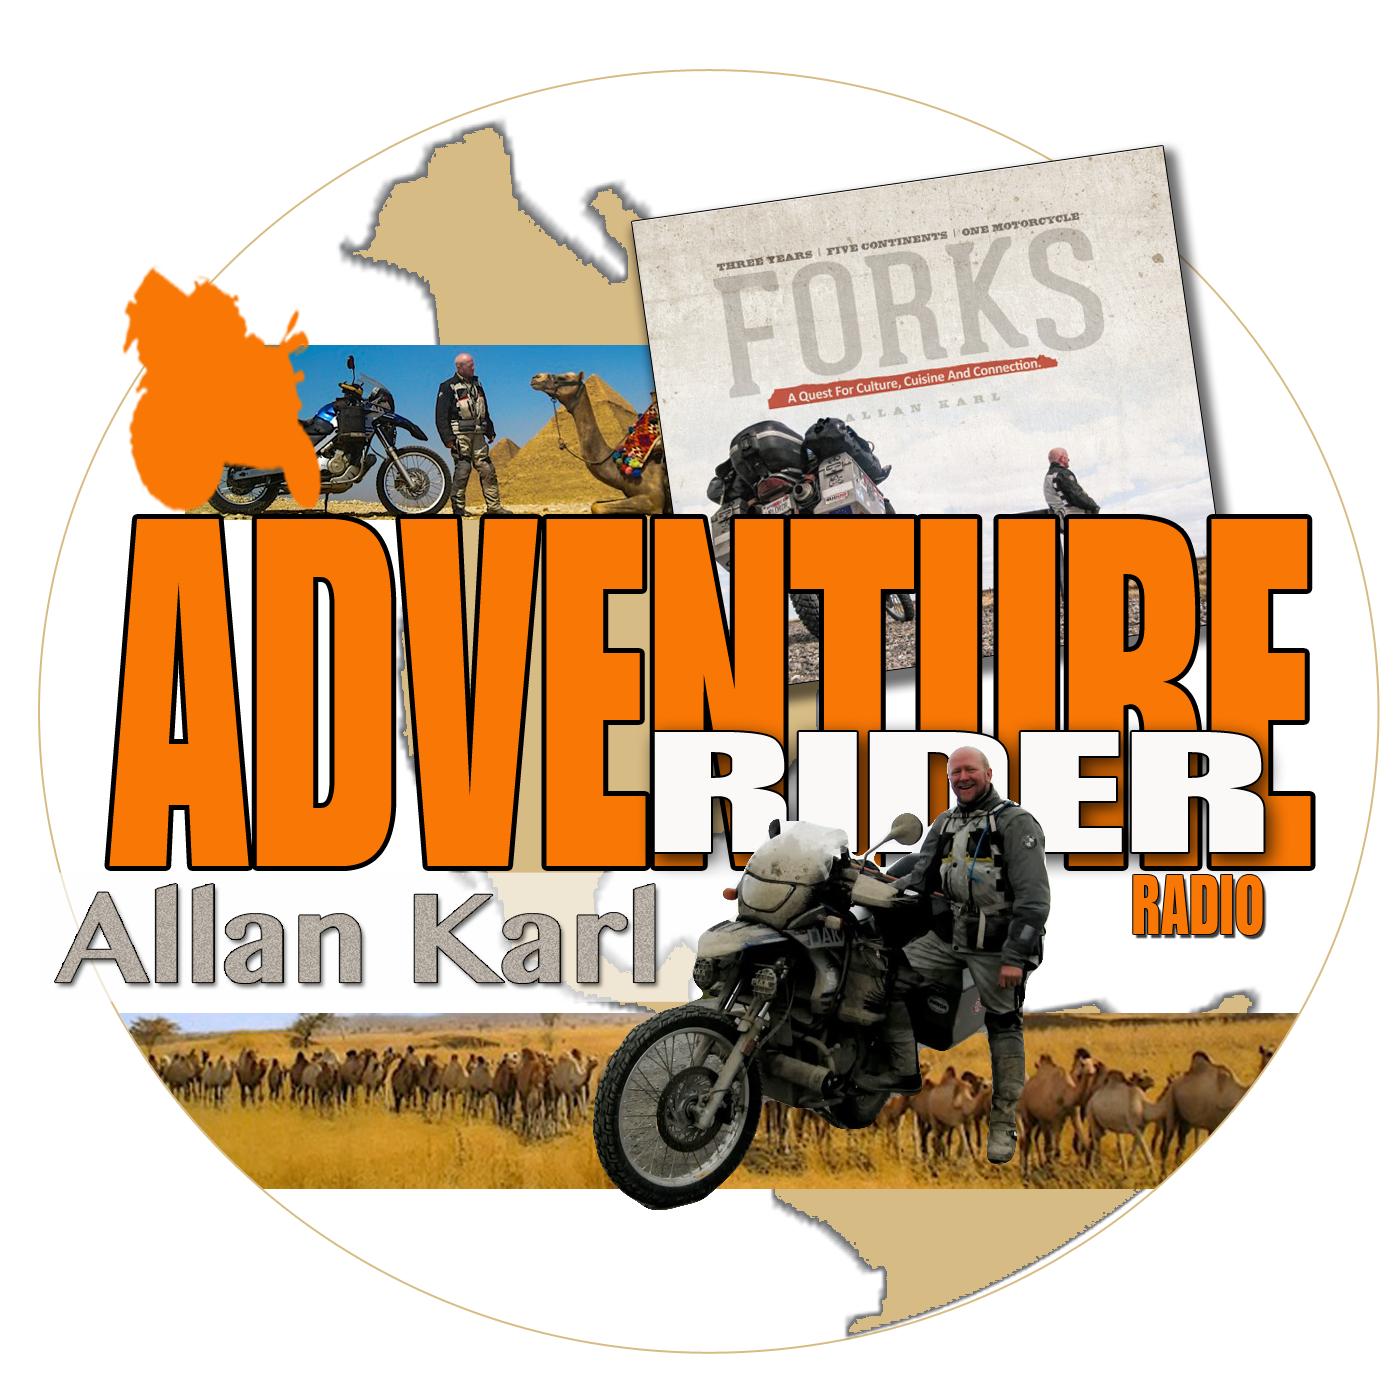 allan-karl-forks-the-book